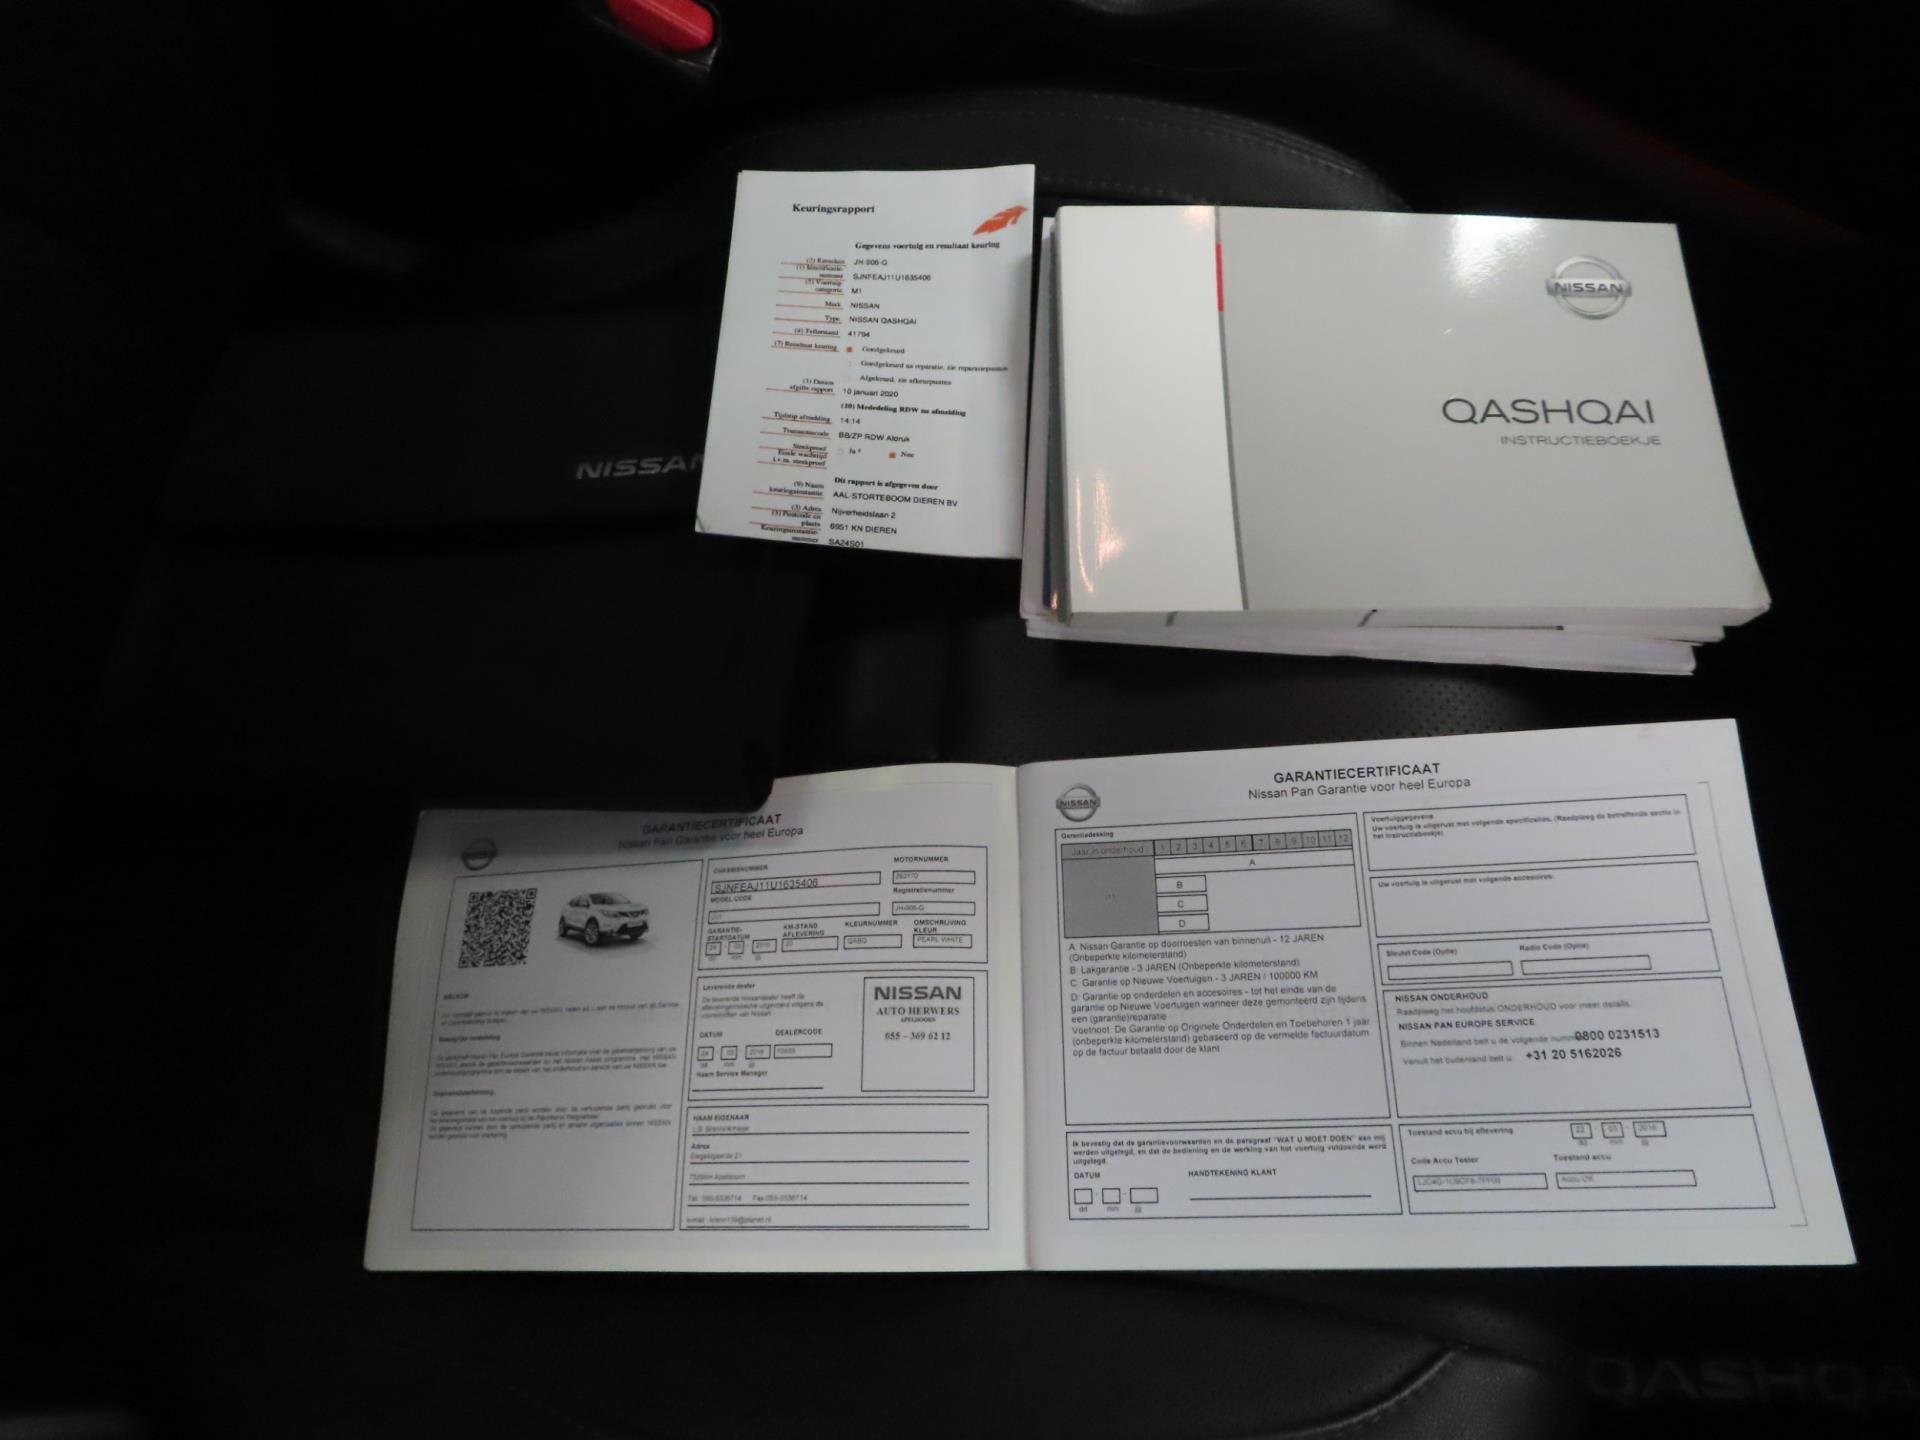 Nissan Qashqai occasion - Garagebedrijf P. Glas 't Zand